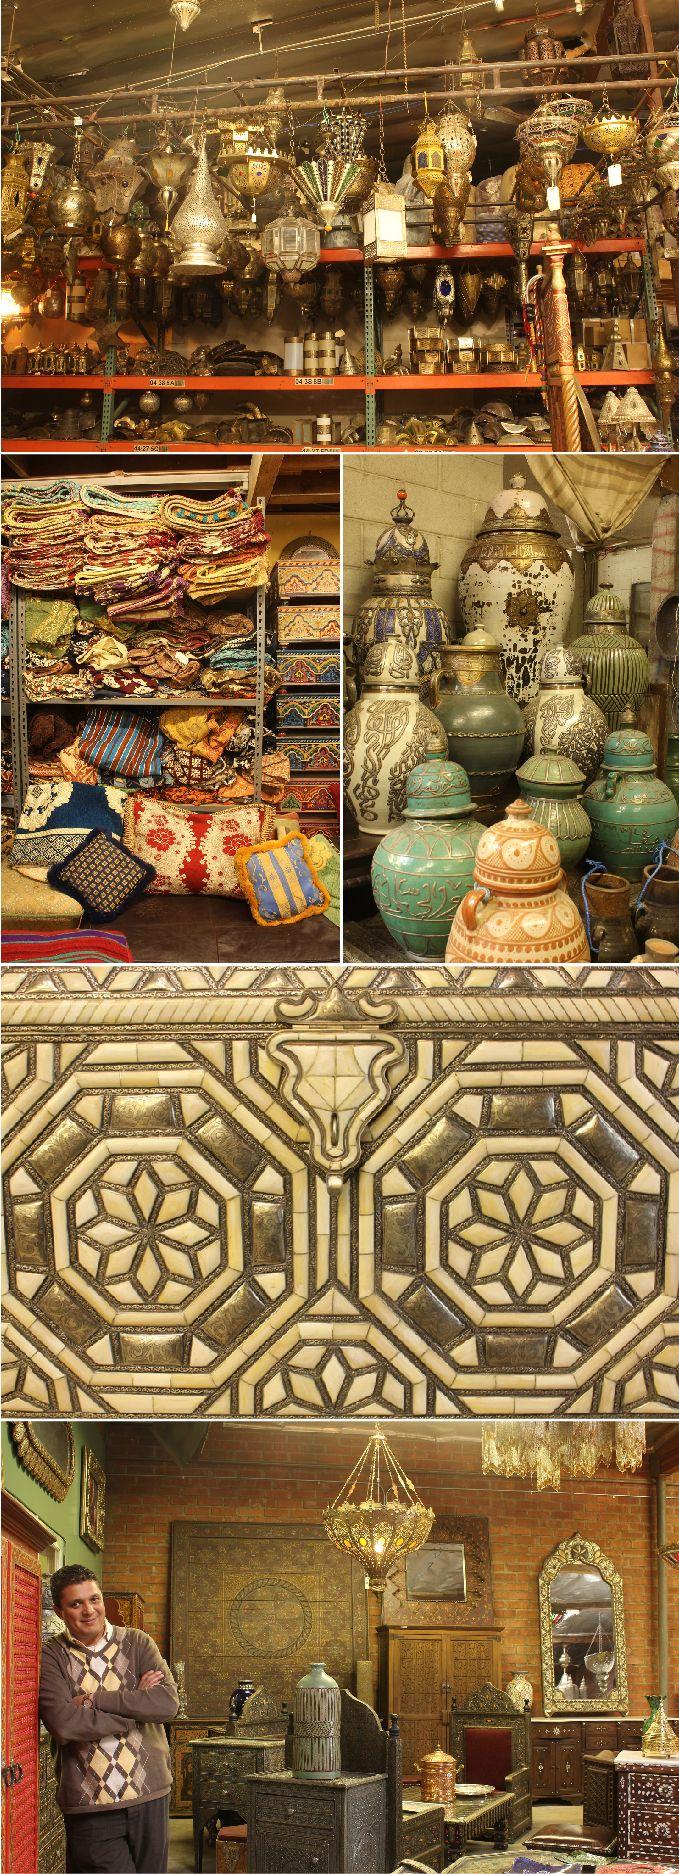 Mediterranean living room los angeles by badia design inc - Badia Design In Los Angeles Has The Best Selection Of Moroccan Decor